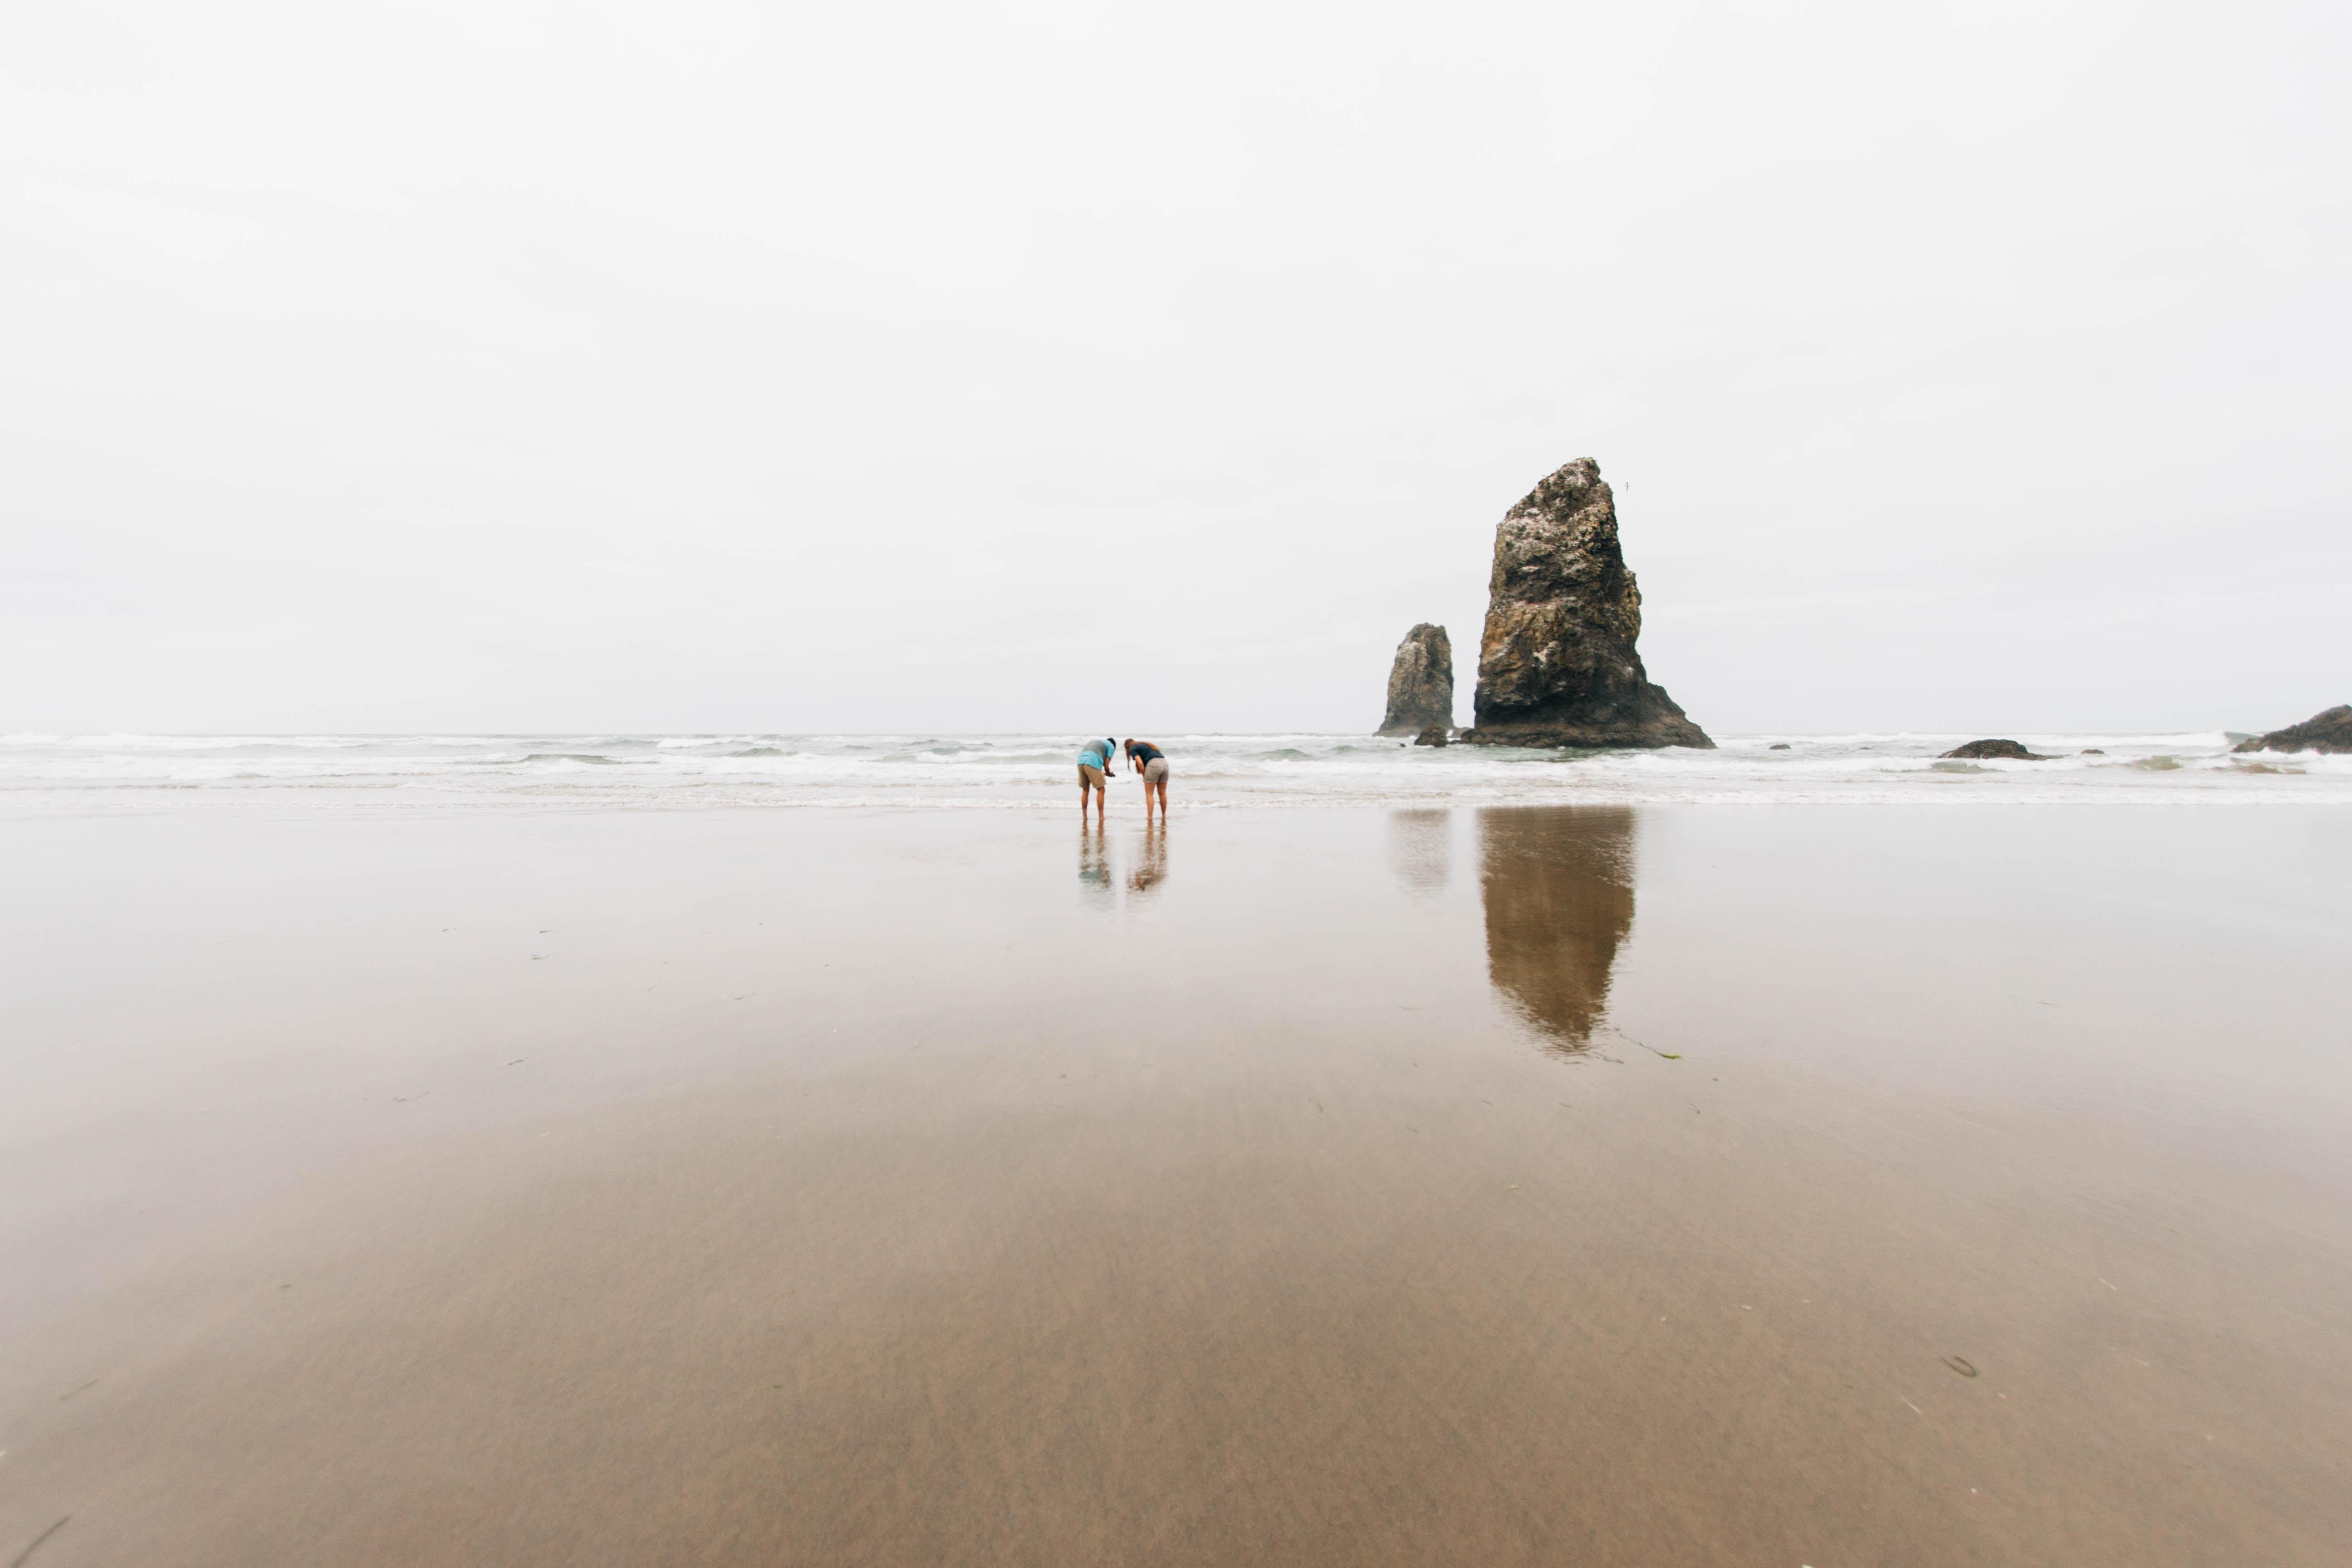 rock formation on shoreline